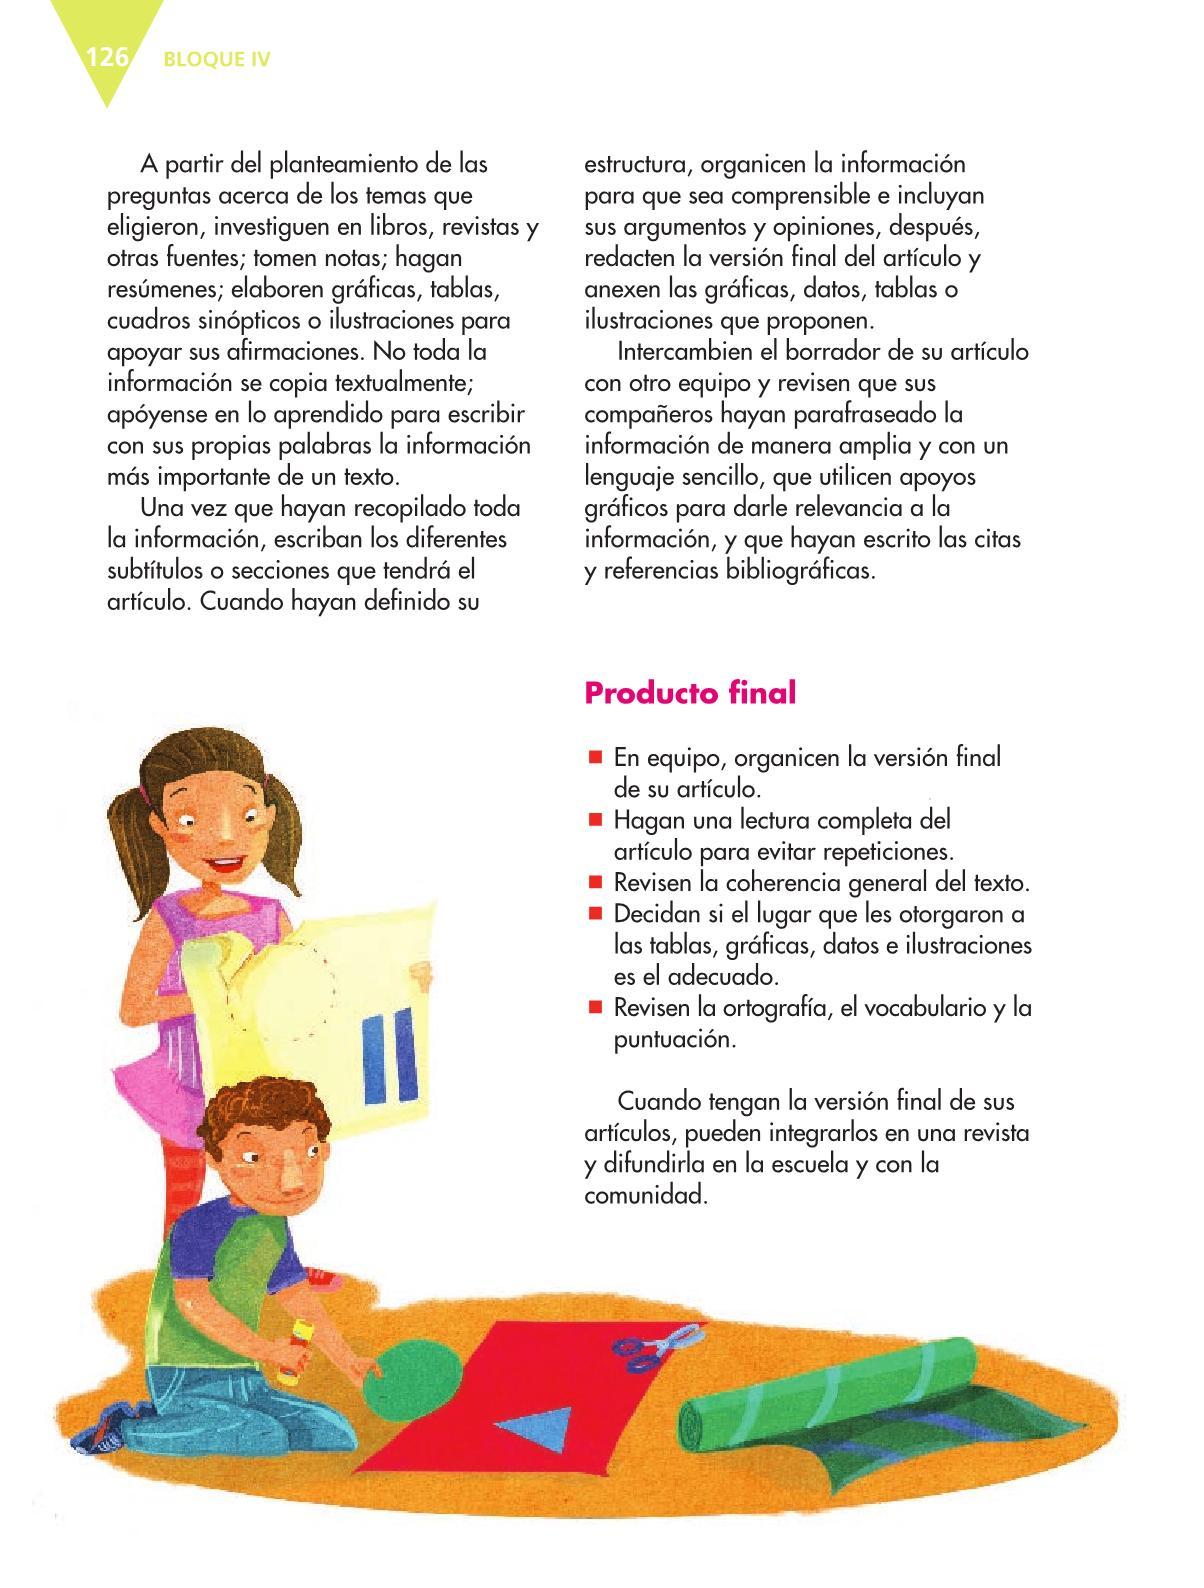 Español Libro para el alumnoquintoPagina 126